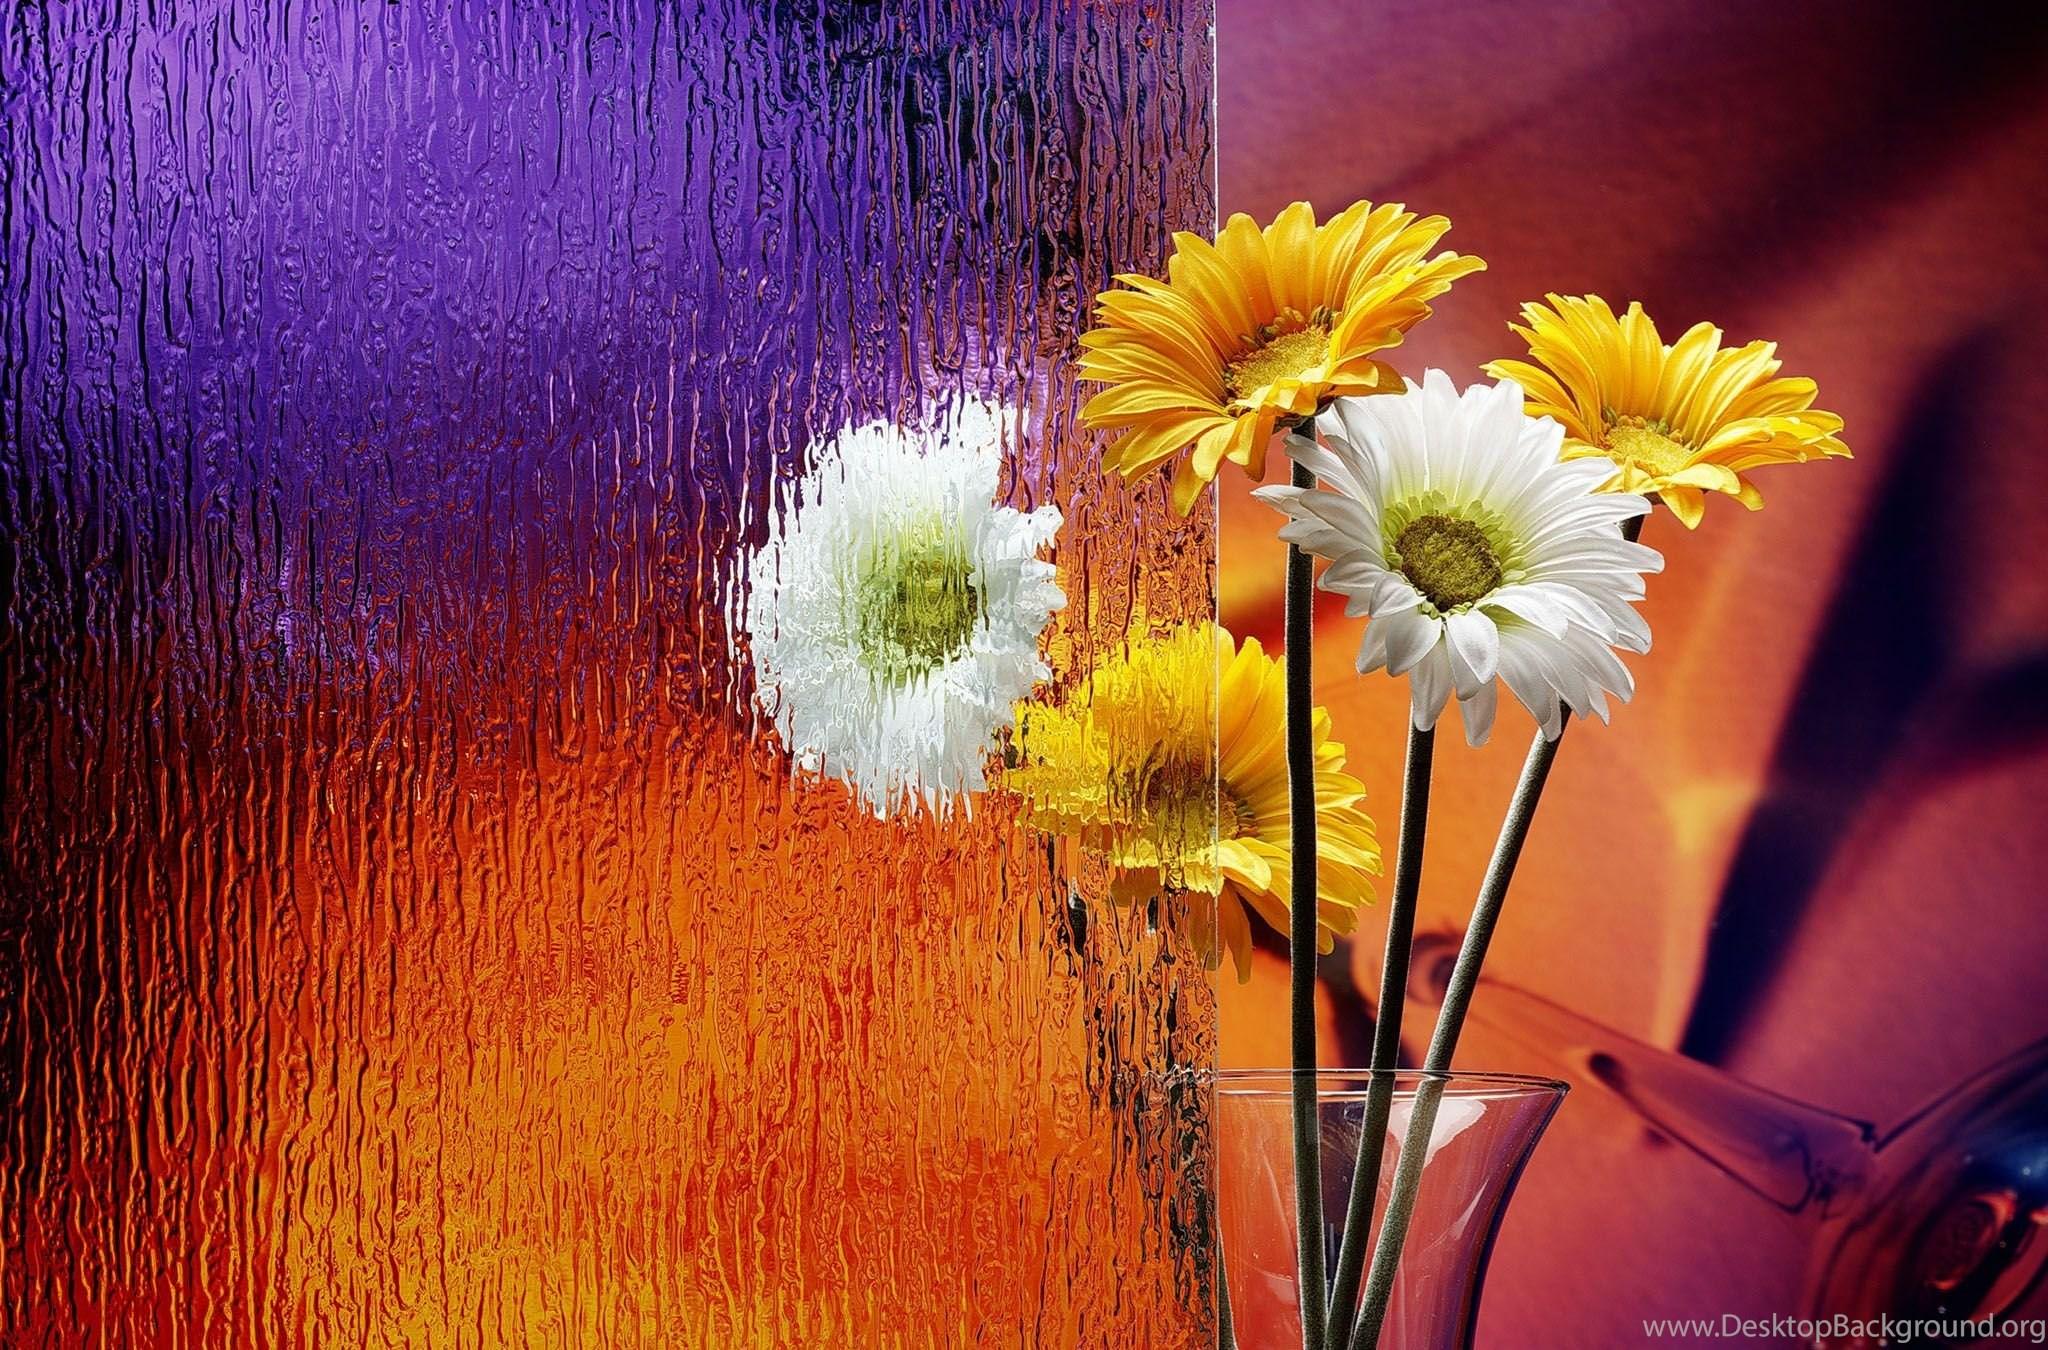 flowers wallpapers free download pc desktop background